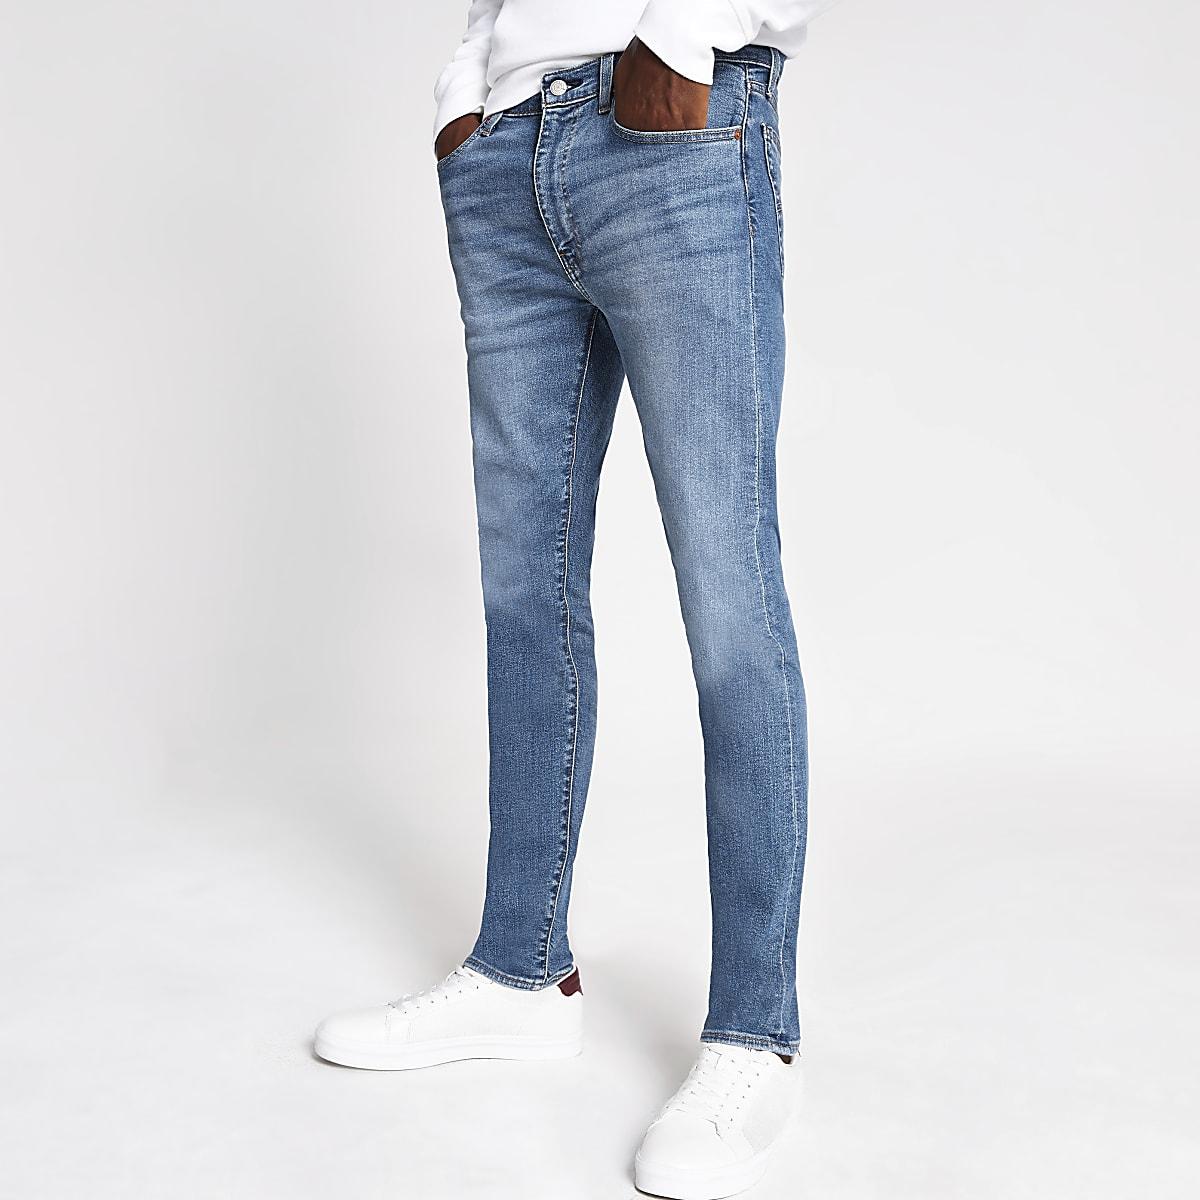 Levi's – 519 – Hellblaue Extreme Skinny Jeans